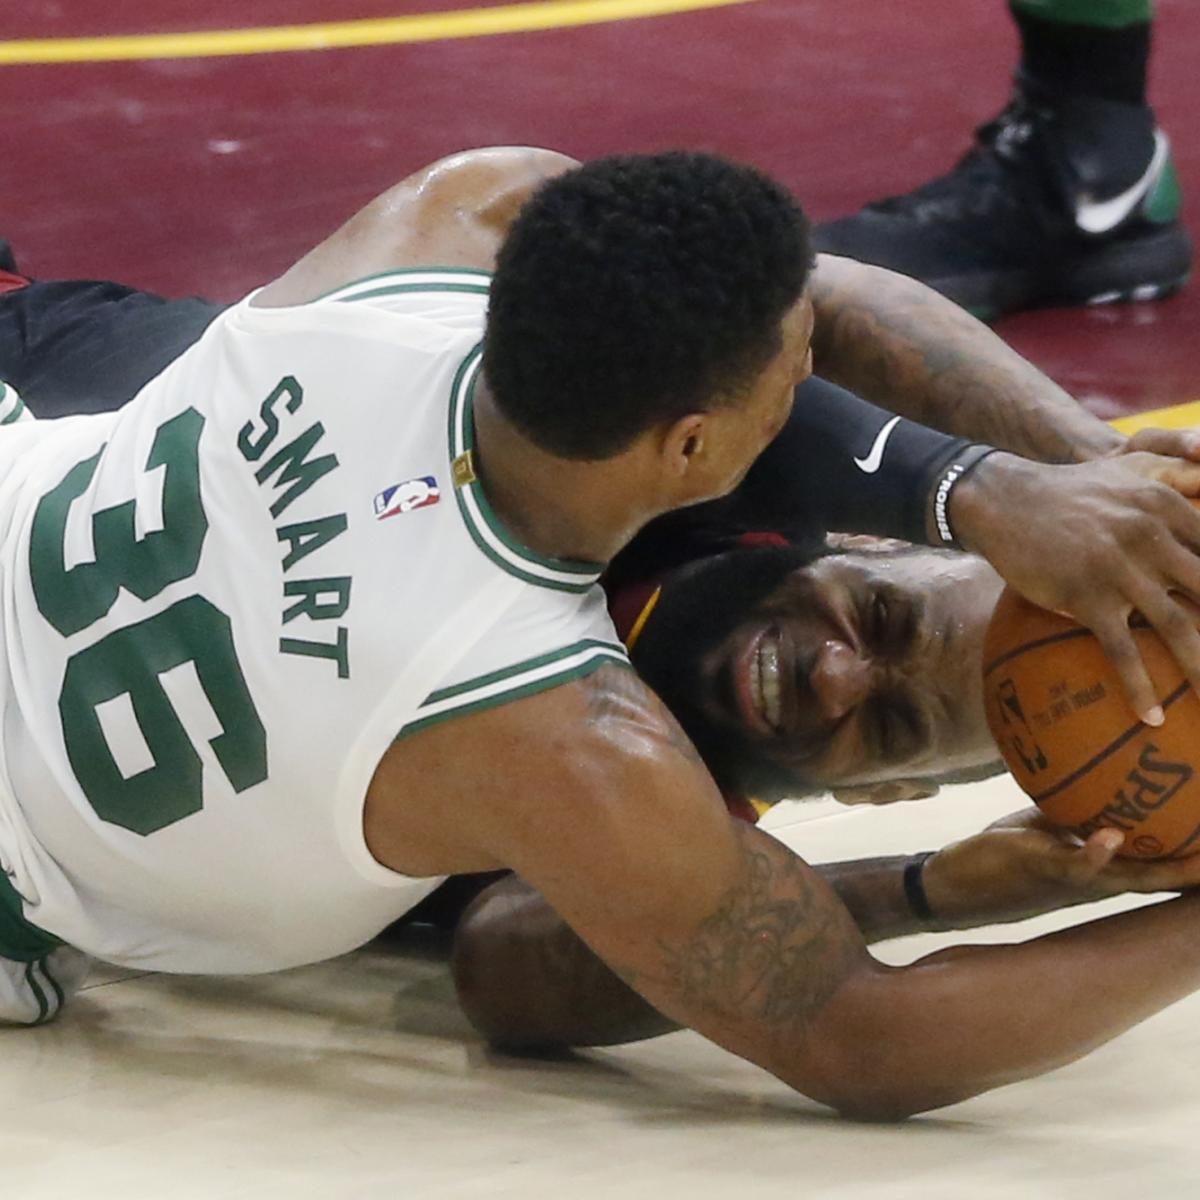 Celtics GM Danny Ainge Calls Free Agent Marcus Smart Boston's 'Top Priority'